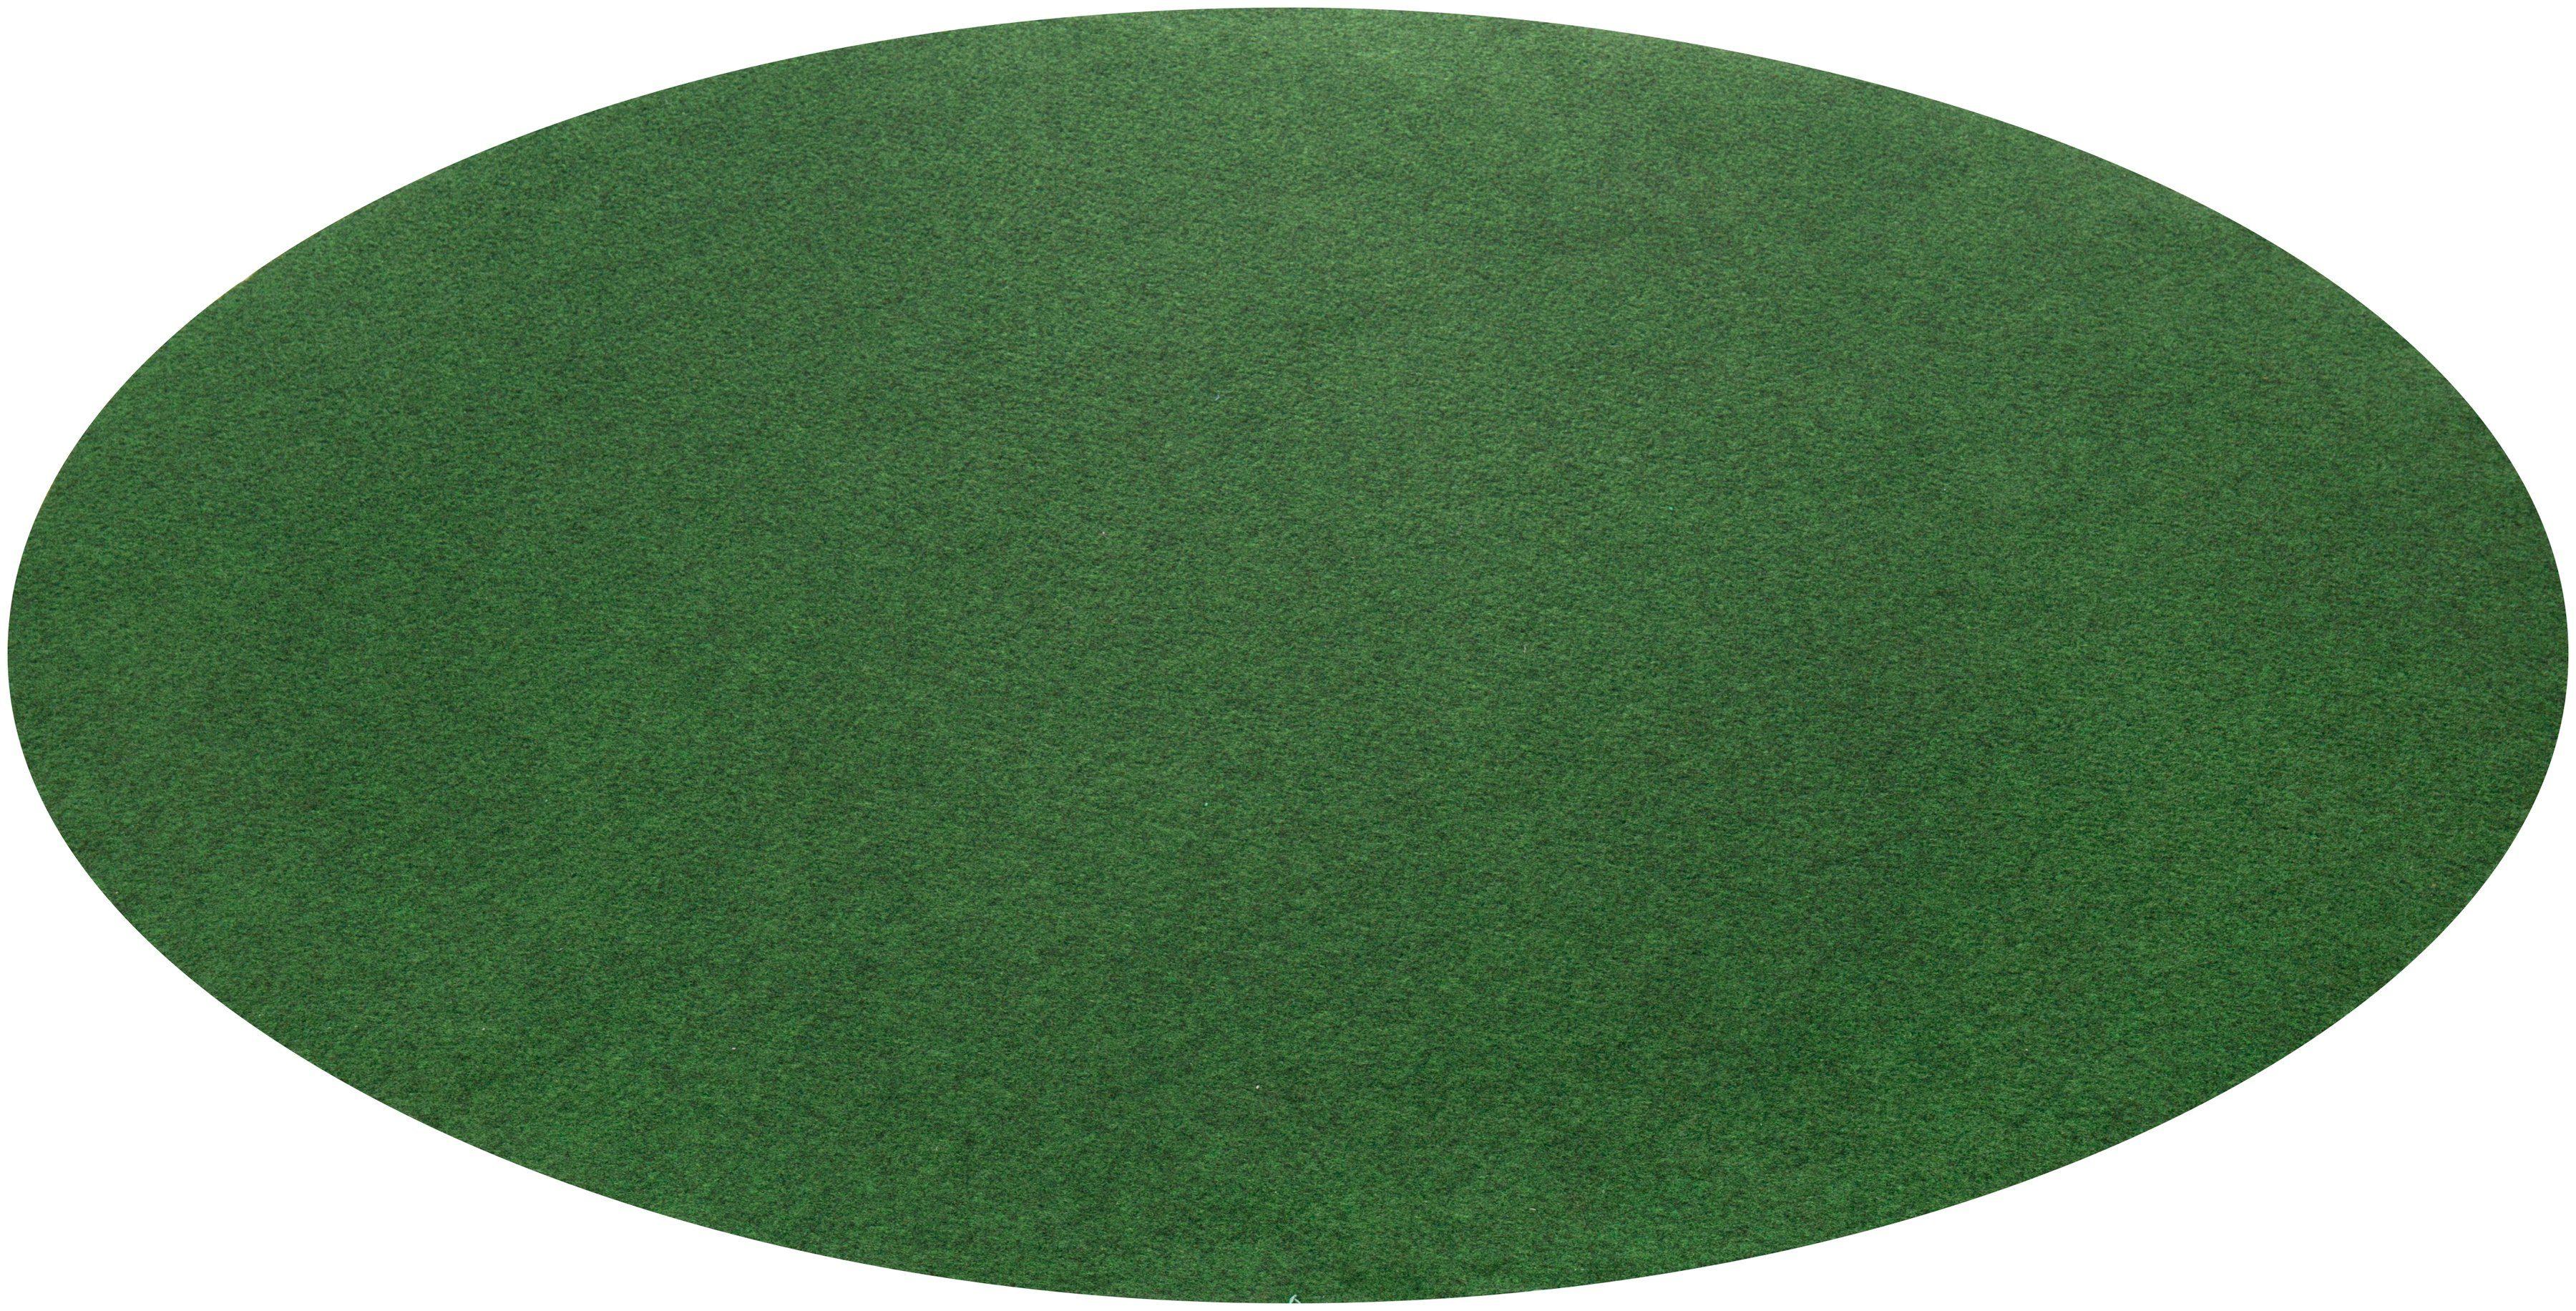 ANDIAMO Kunstrasen »Field«, Ø: 130 cm